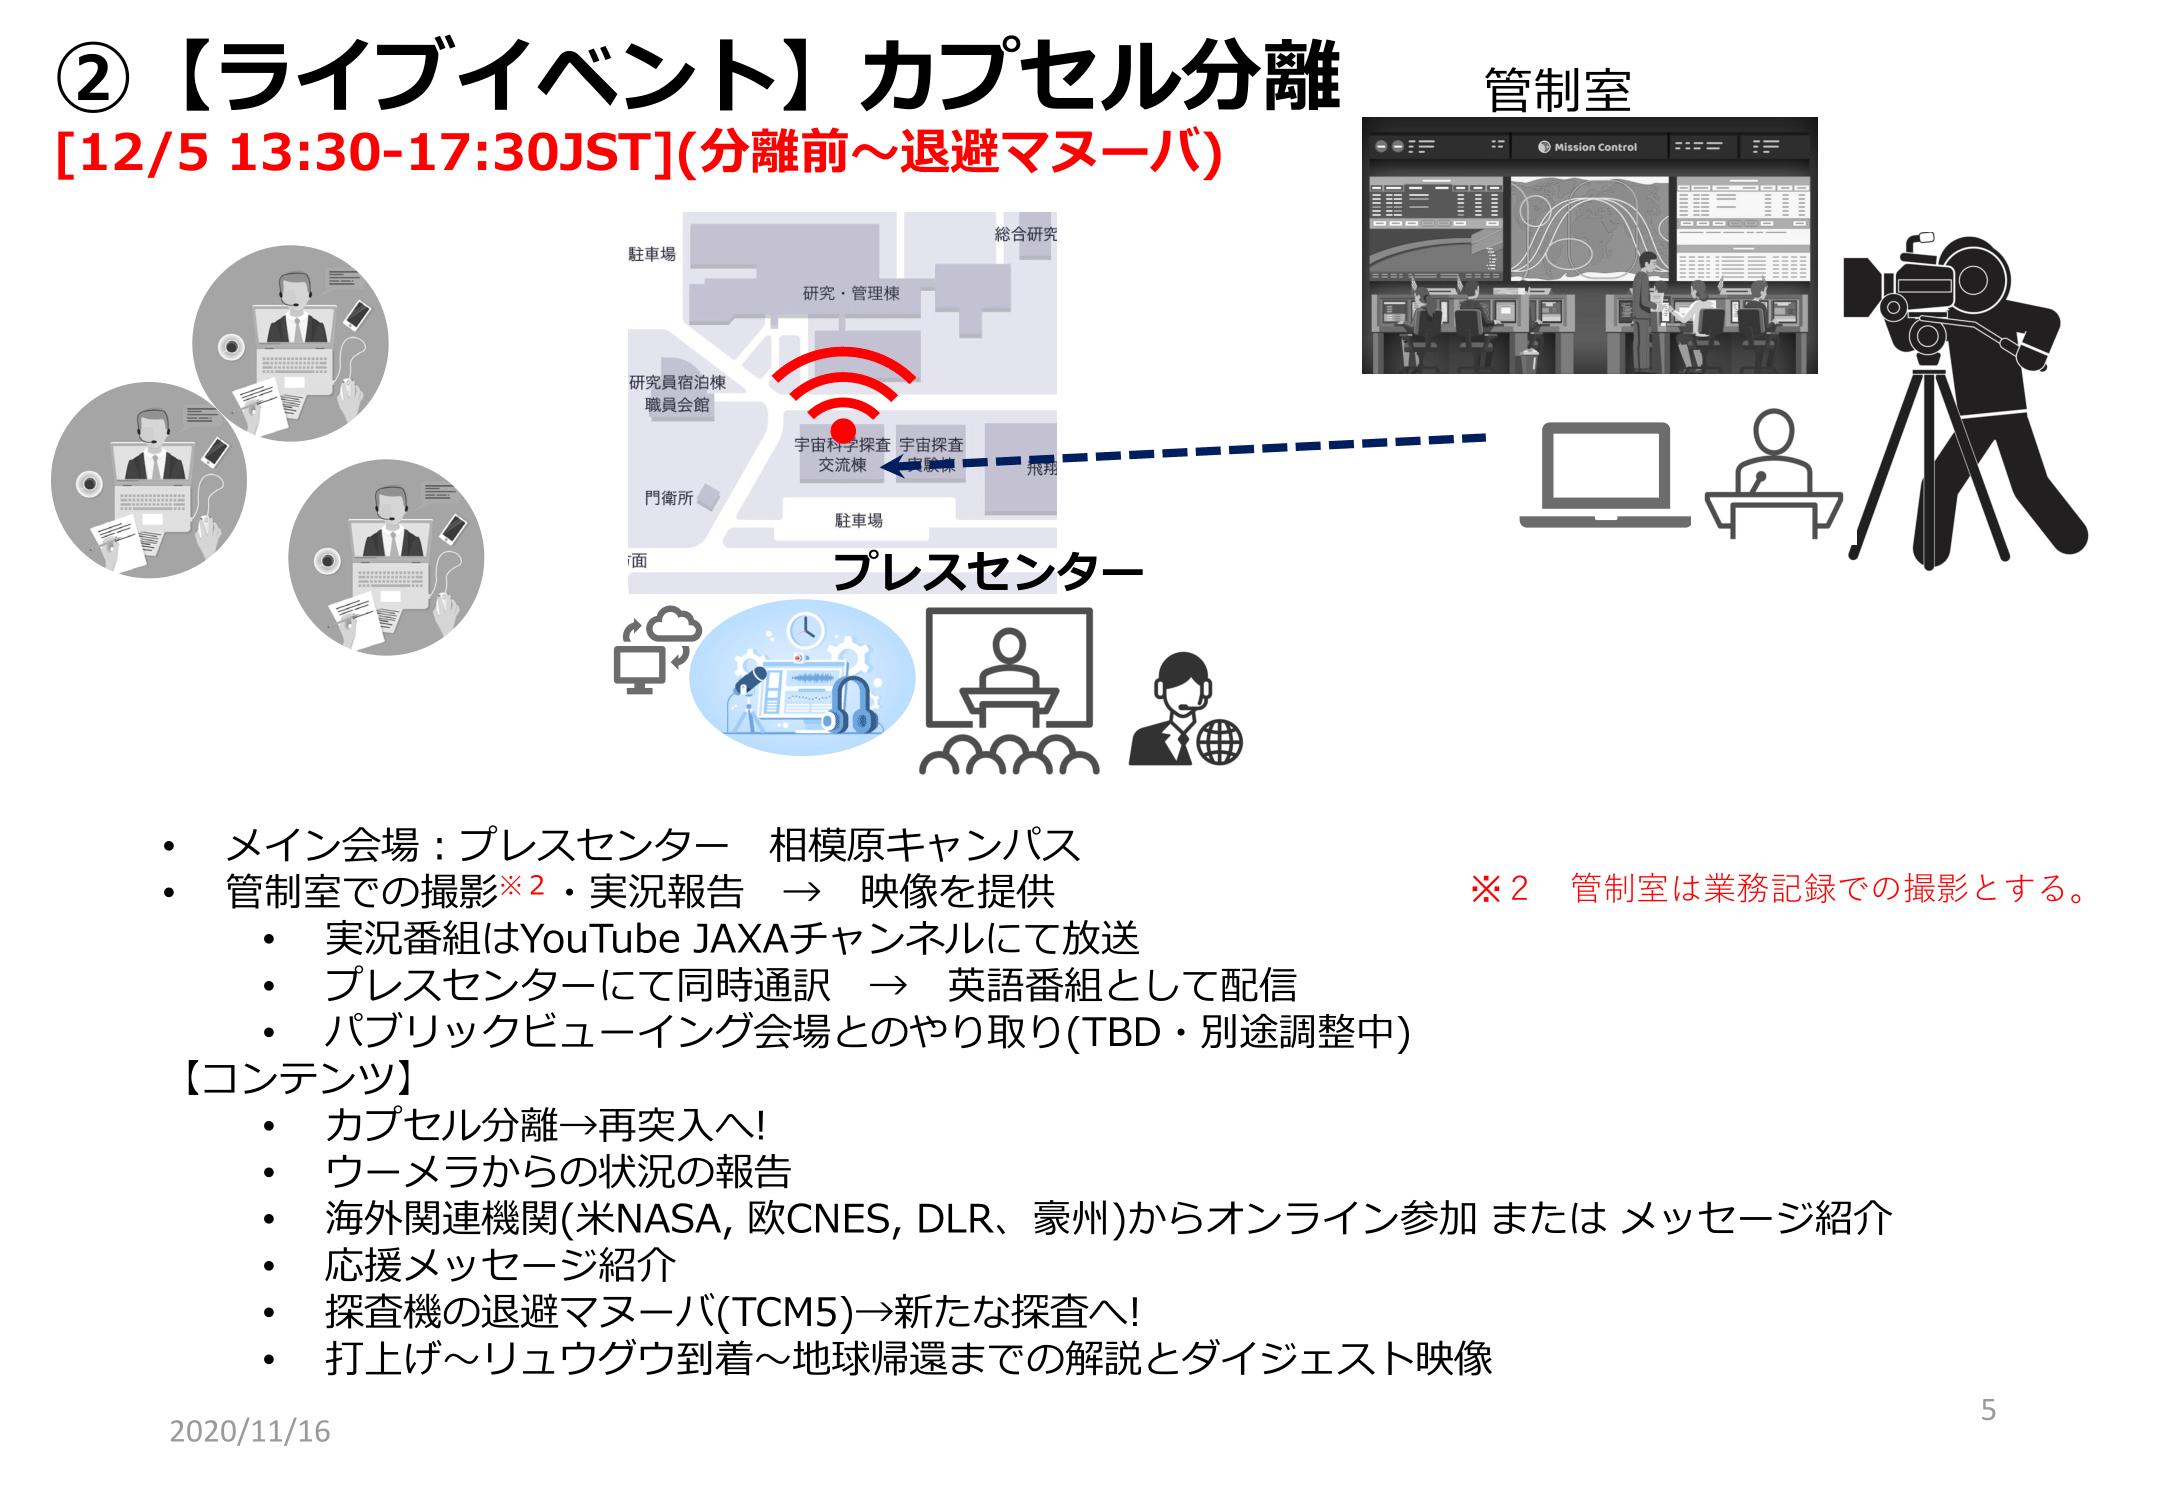 f:id:Imamura:20201117222215p:plain